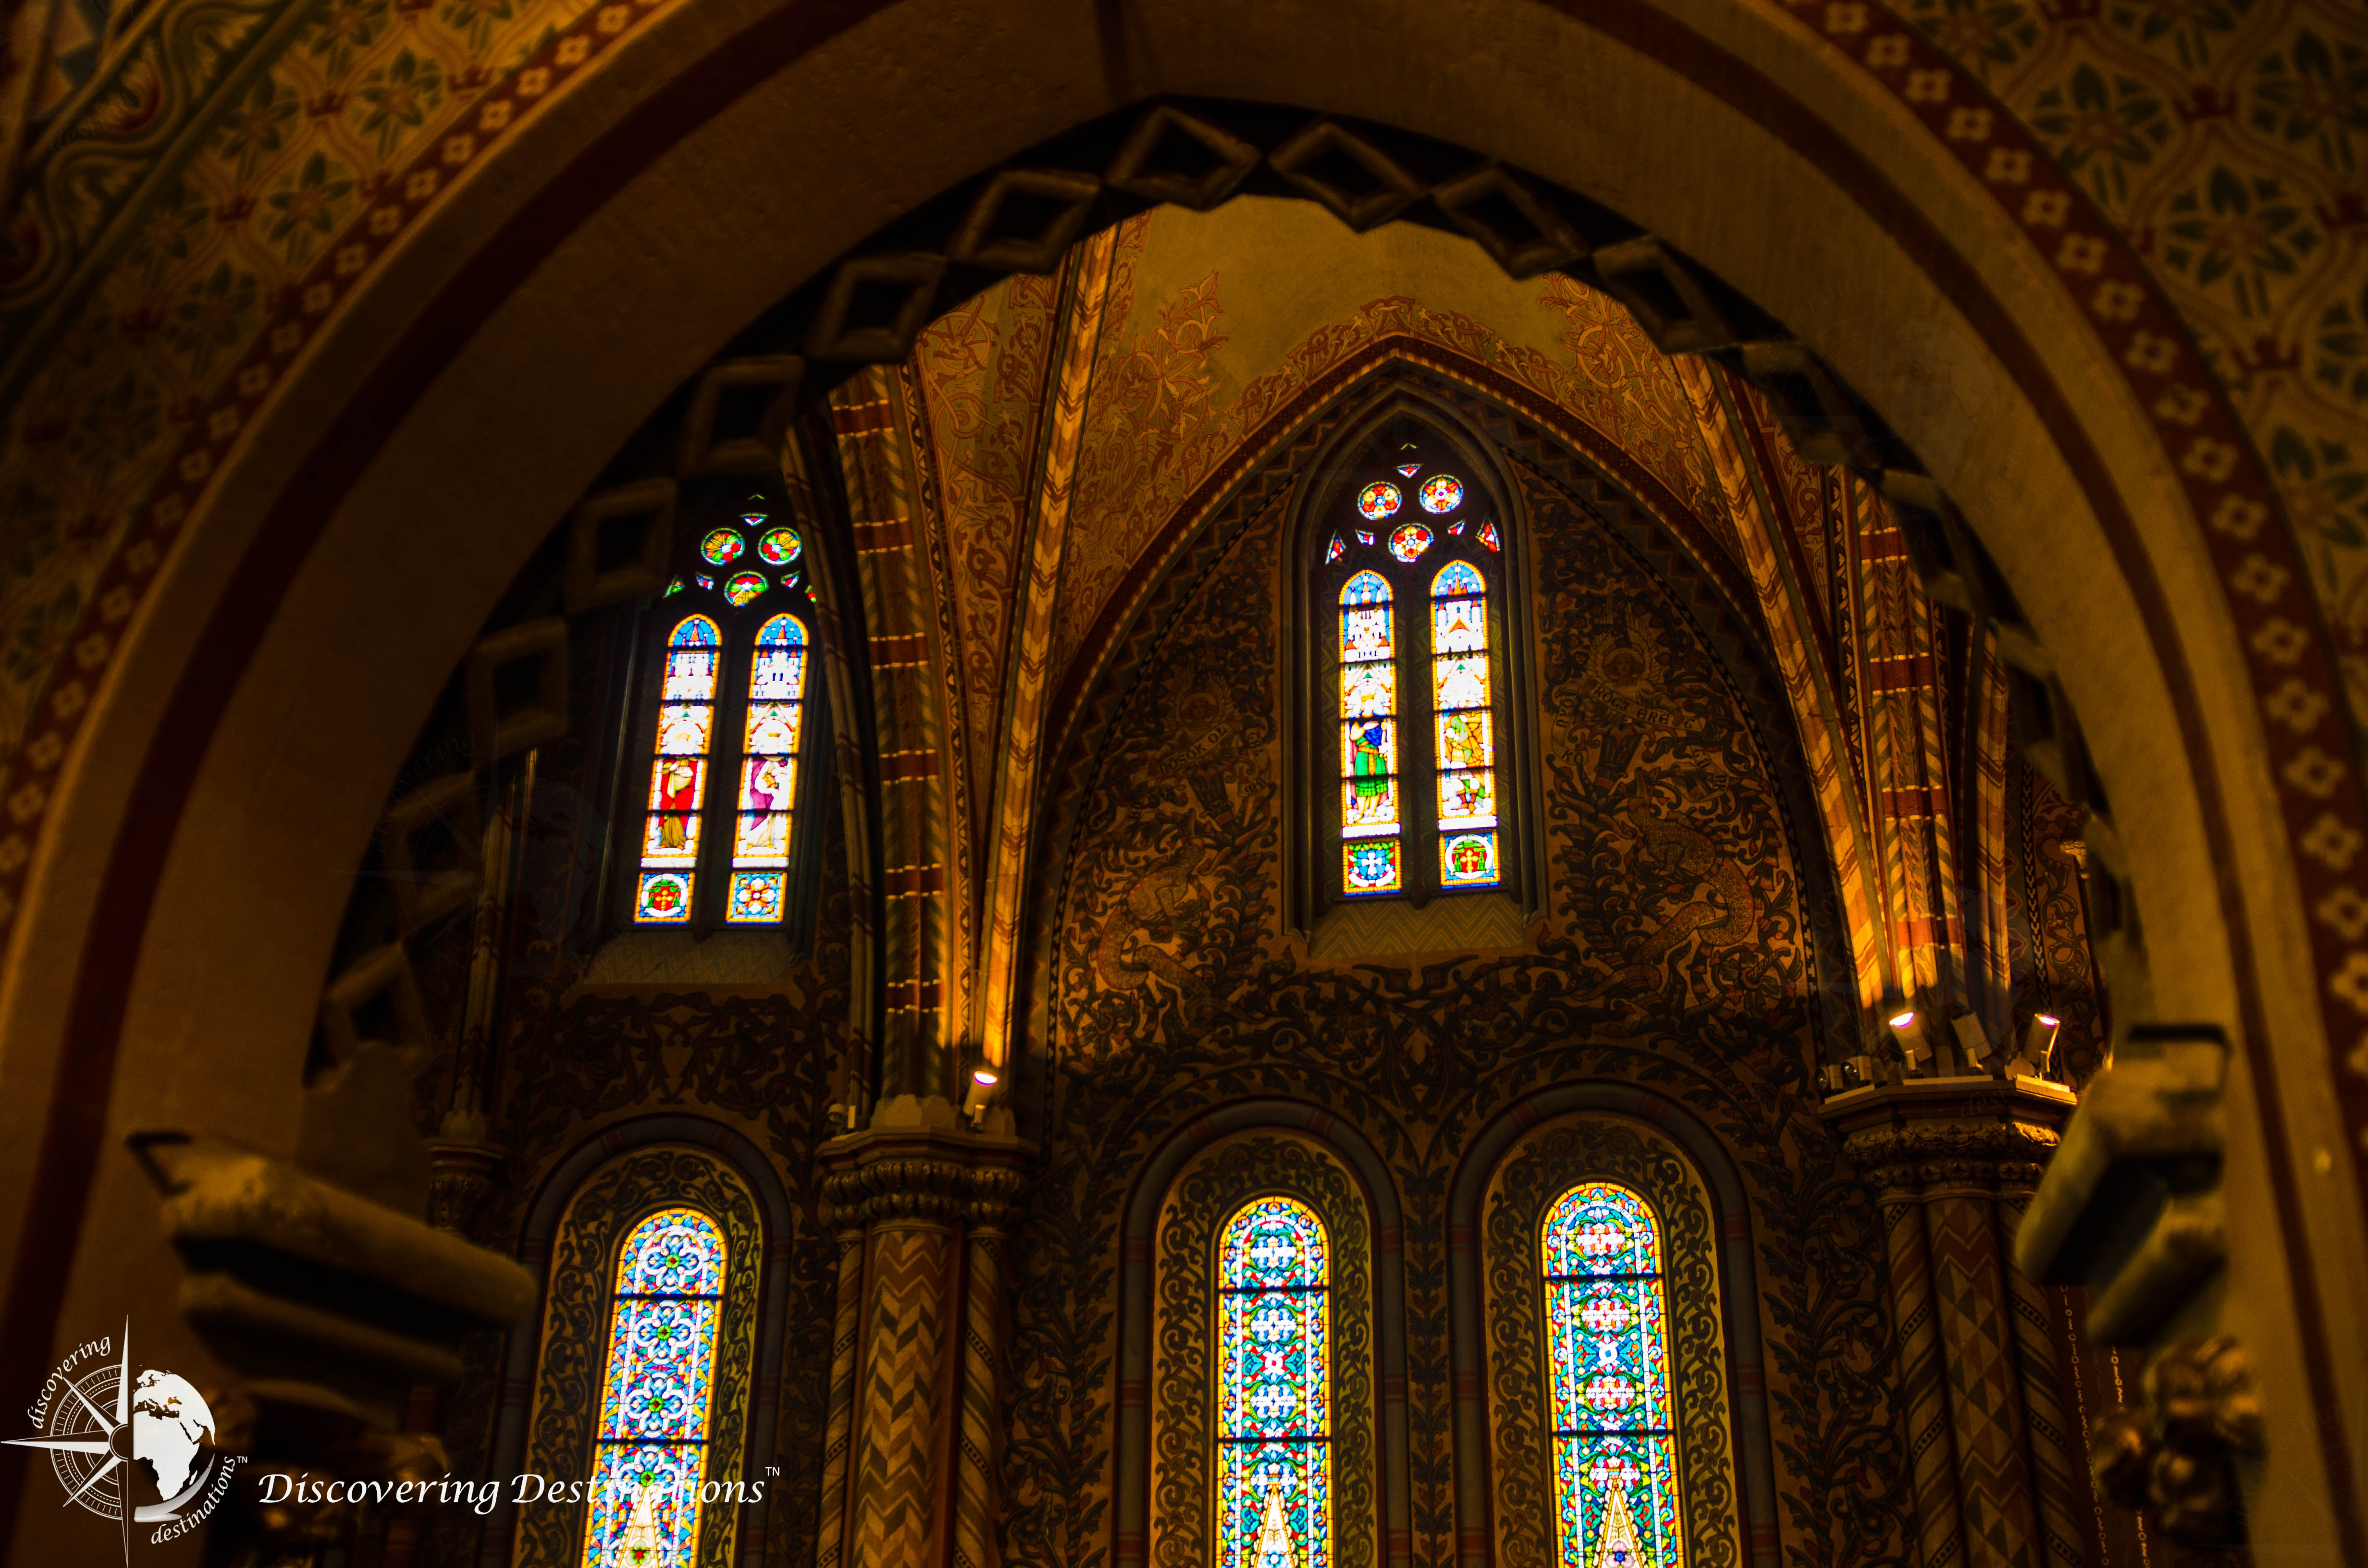 Discovering St Matthias Church